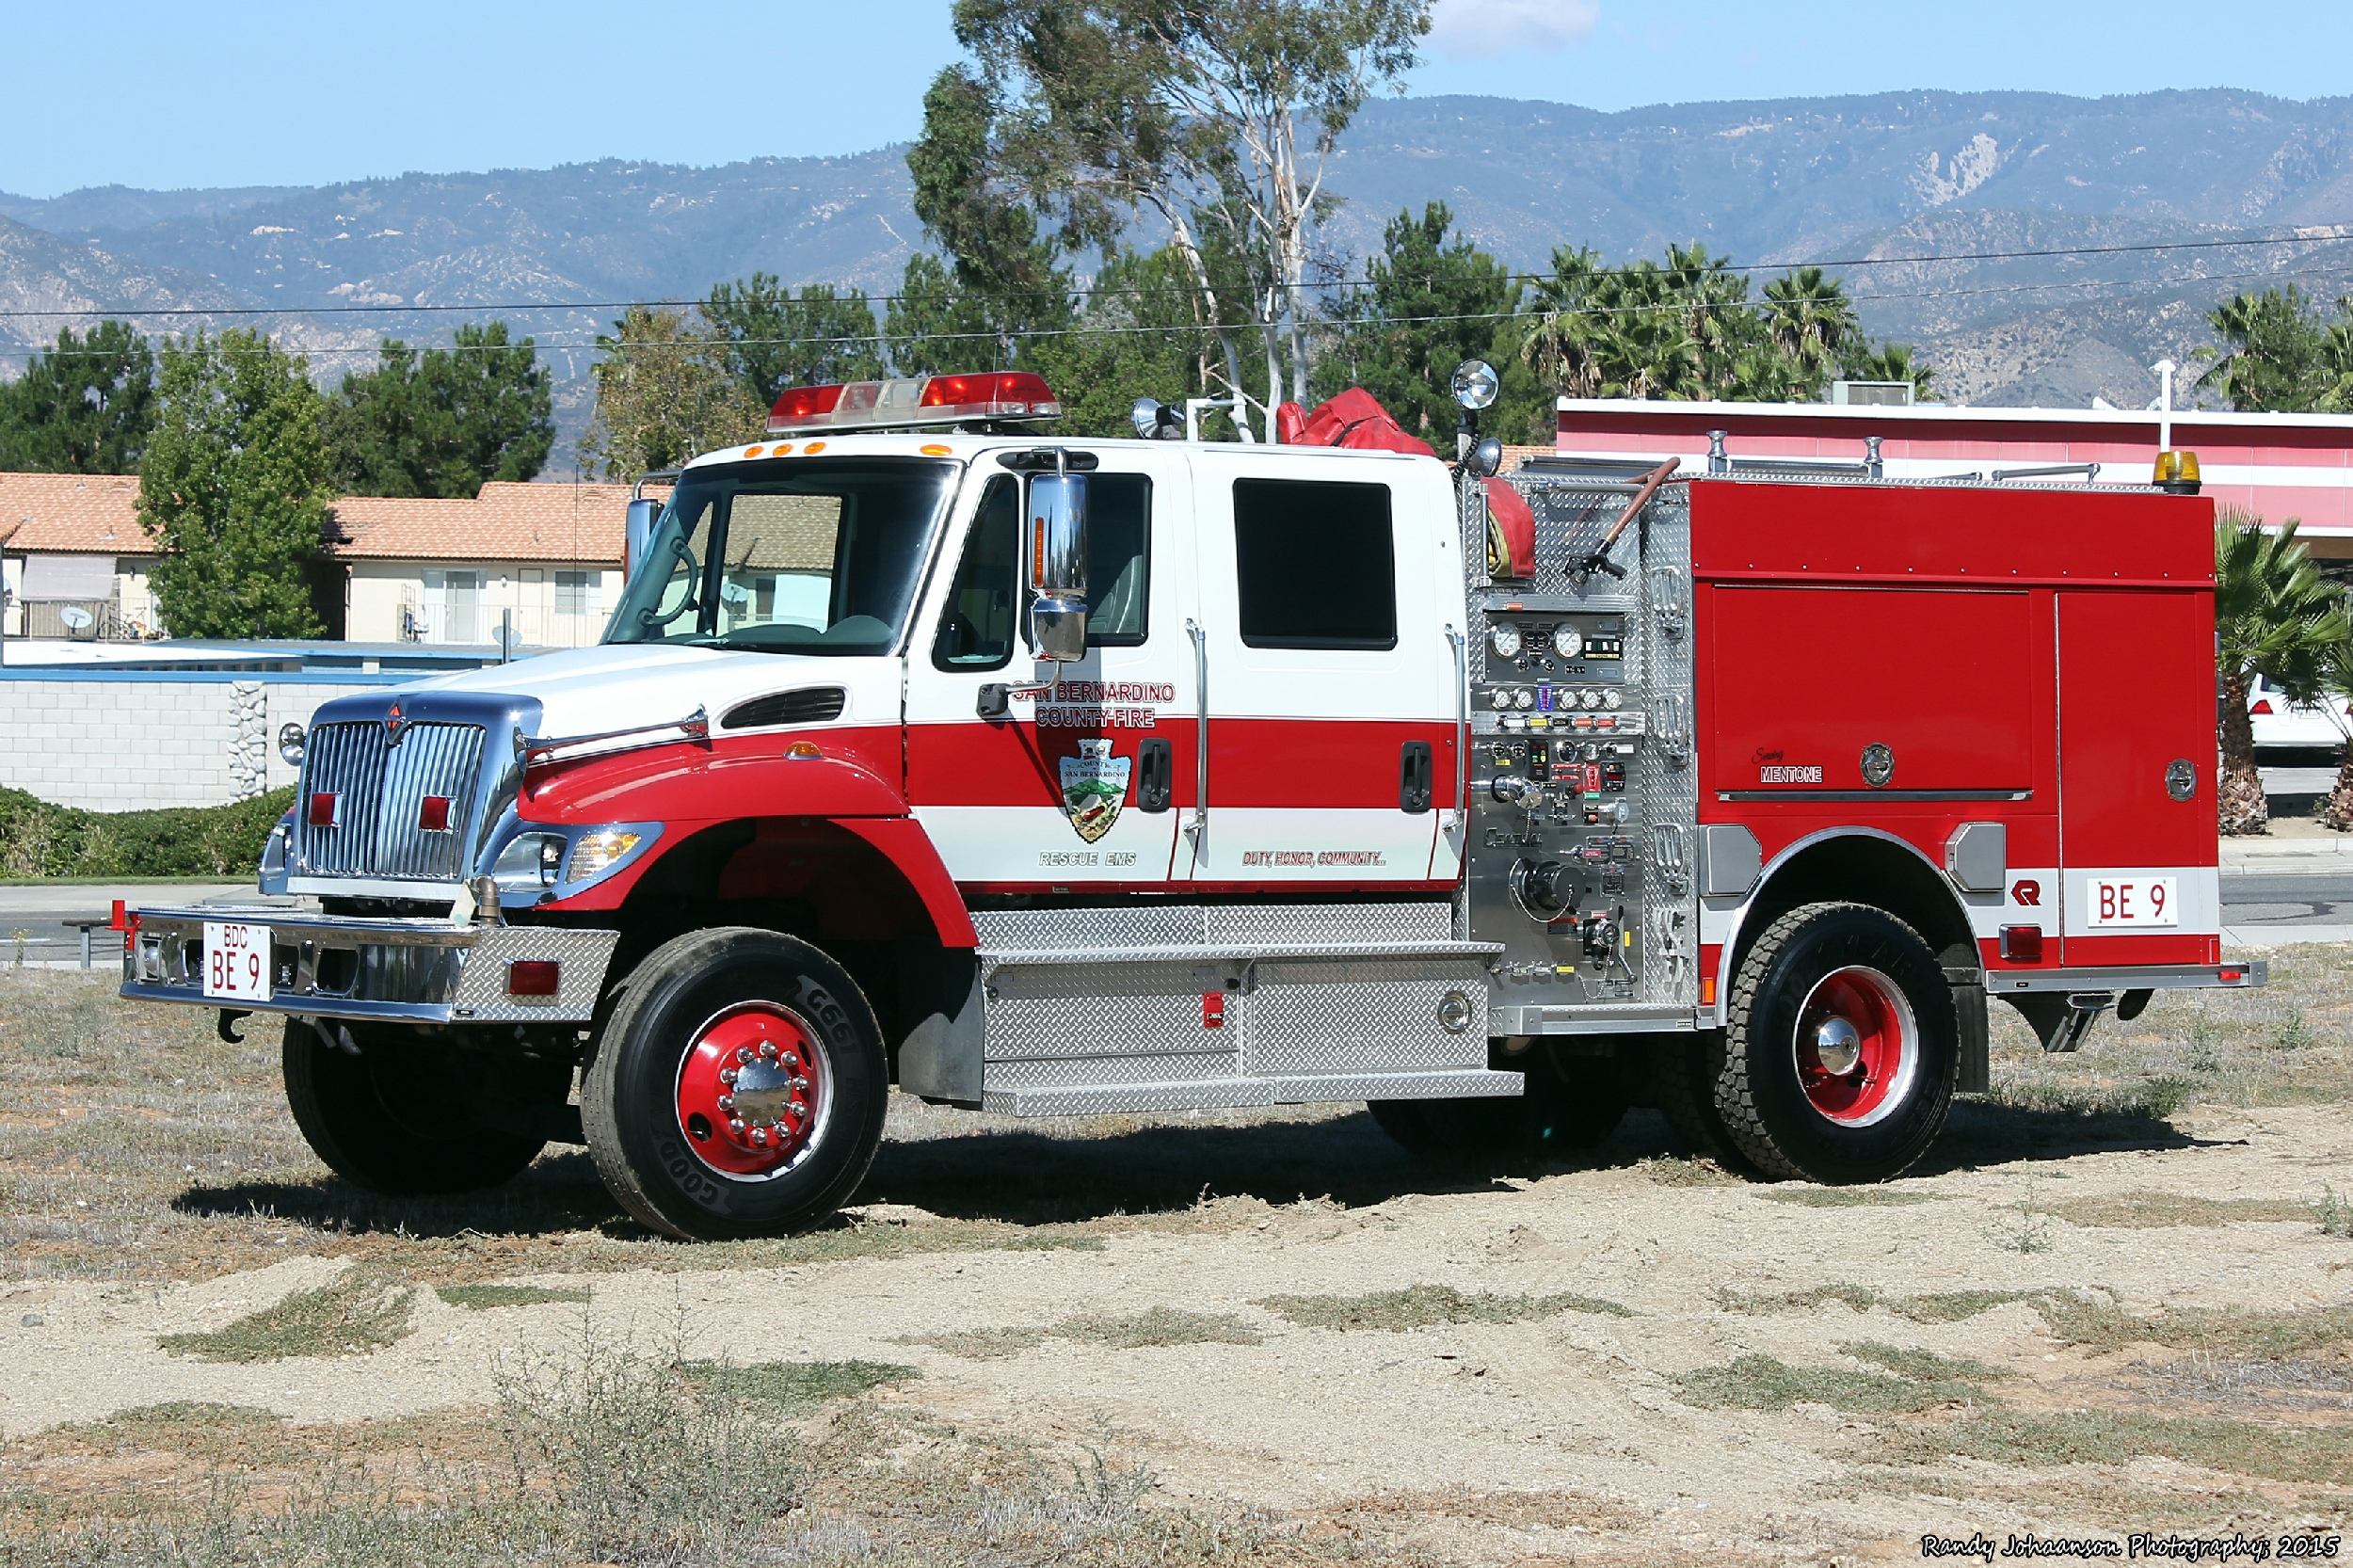 CA, San Bernardino County Fire Department Brush Engine